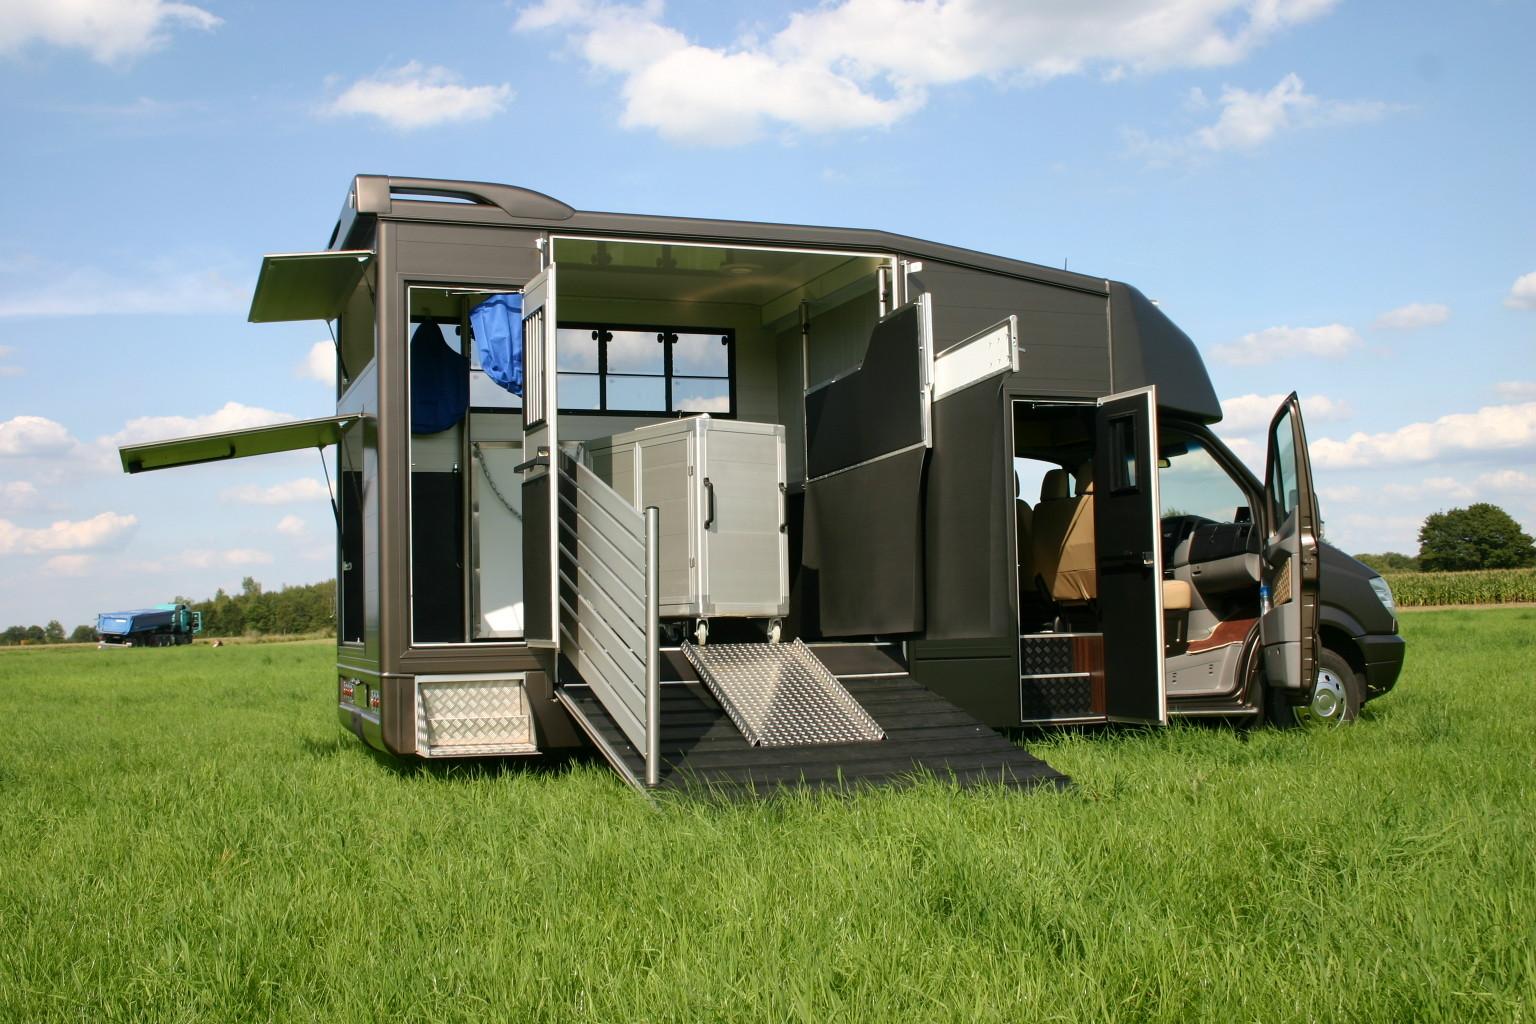 herzlich willkommen pferdetransporter ernst. Black Bedroom Furniture Sets. Home Design Ideas